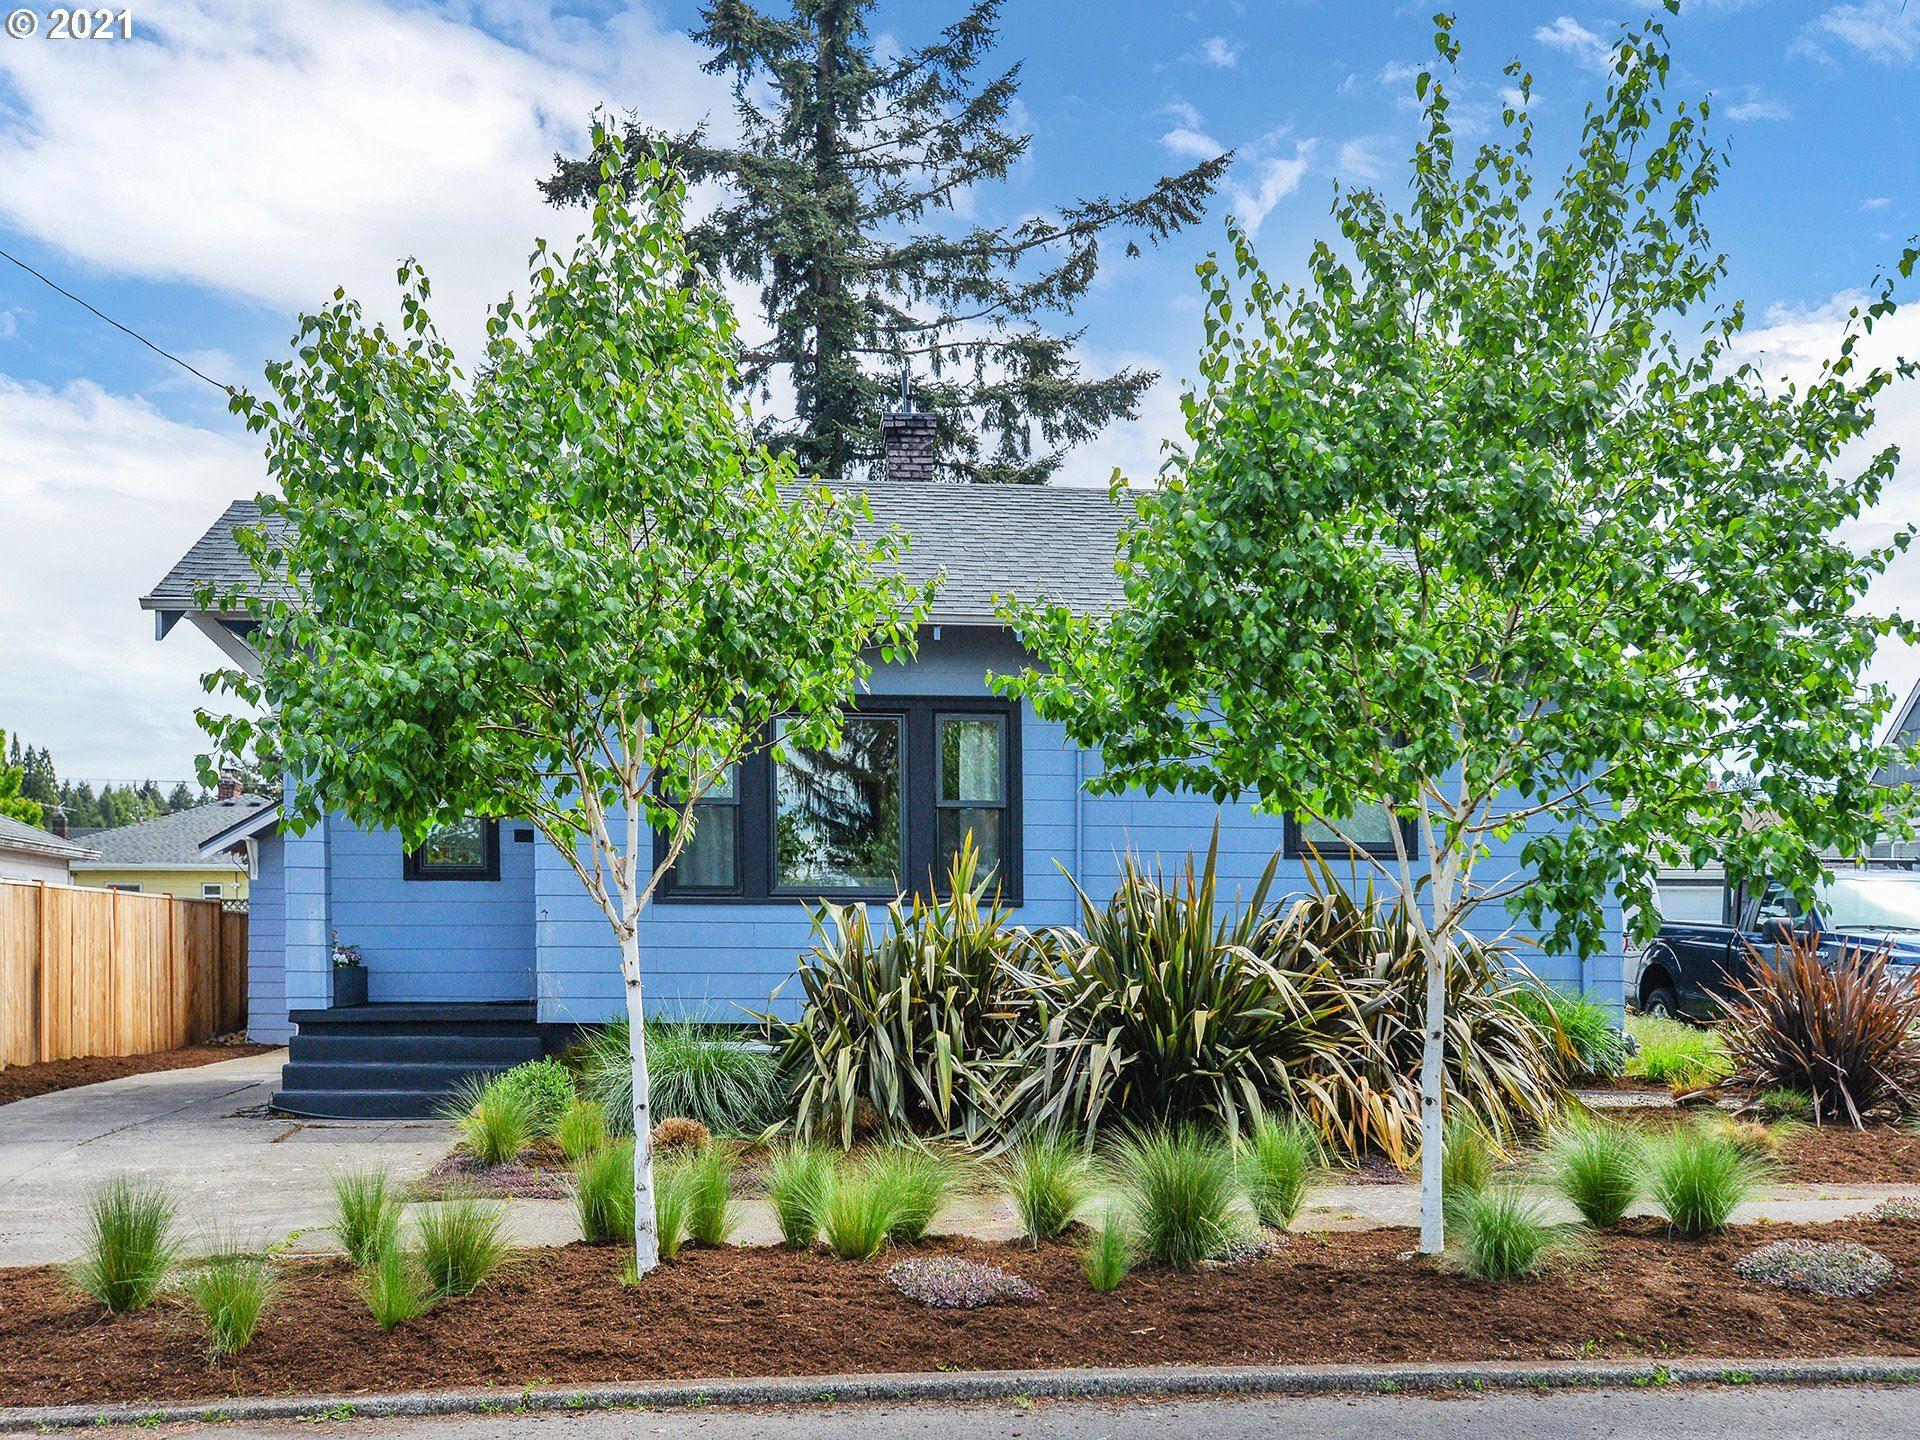 3620 NE 79TH AVE, Portland, OR 97213 - MLS#: 21147009